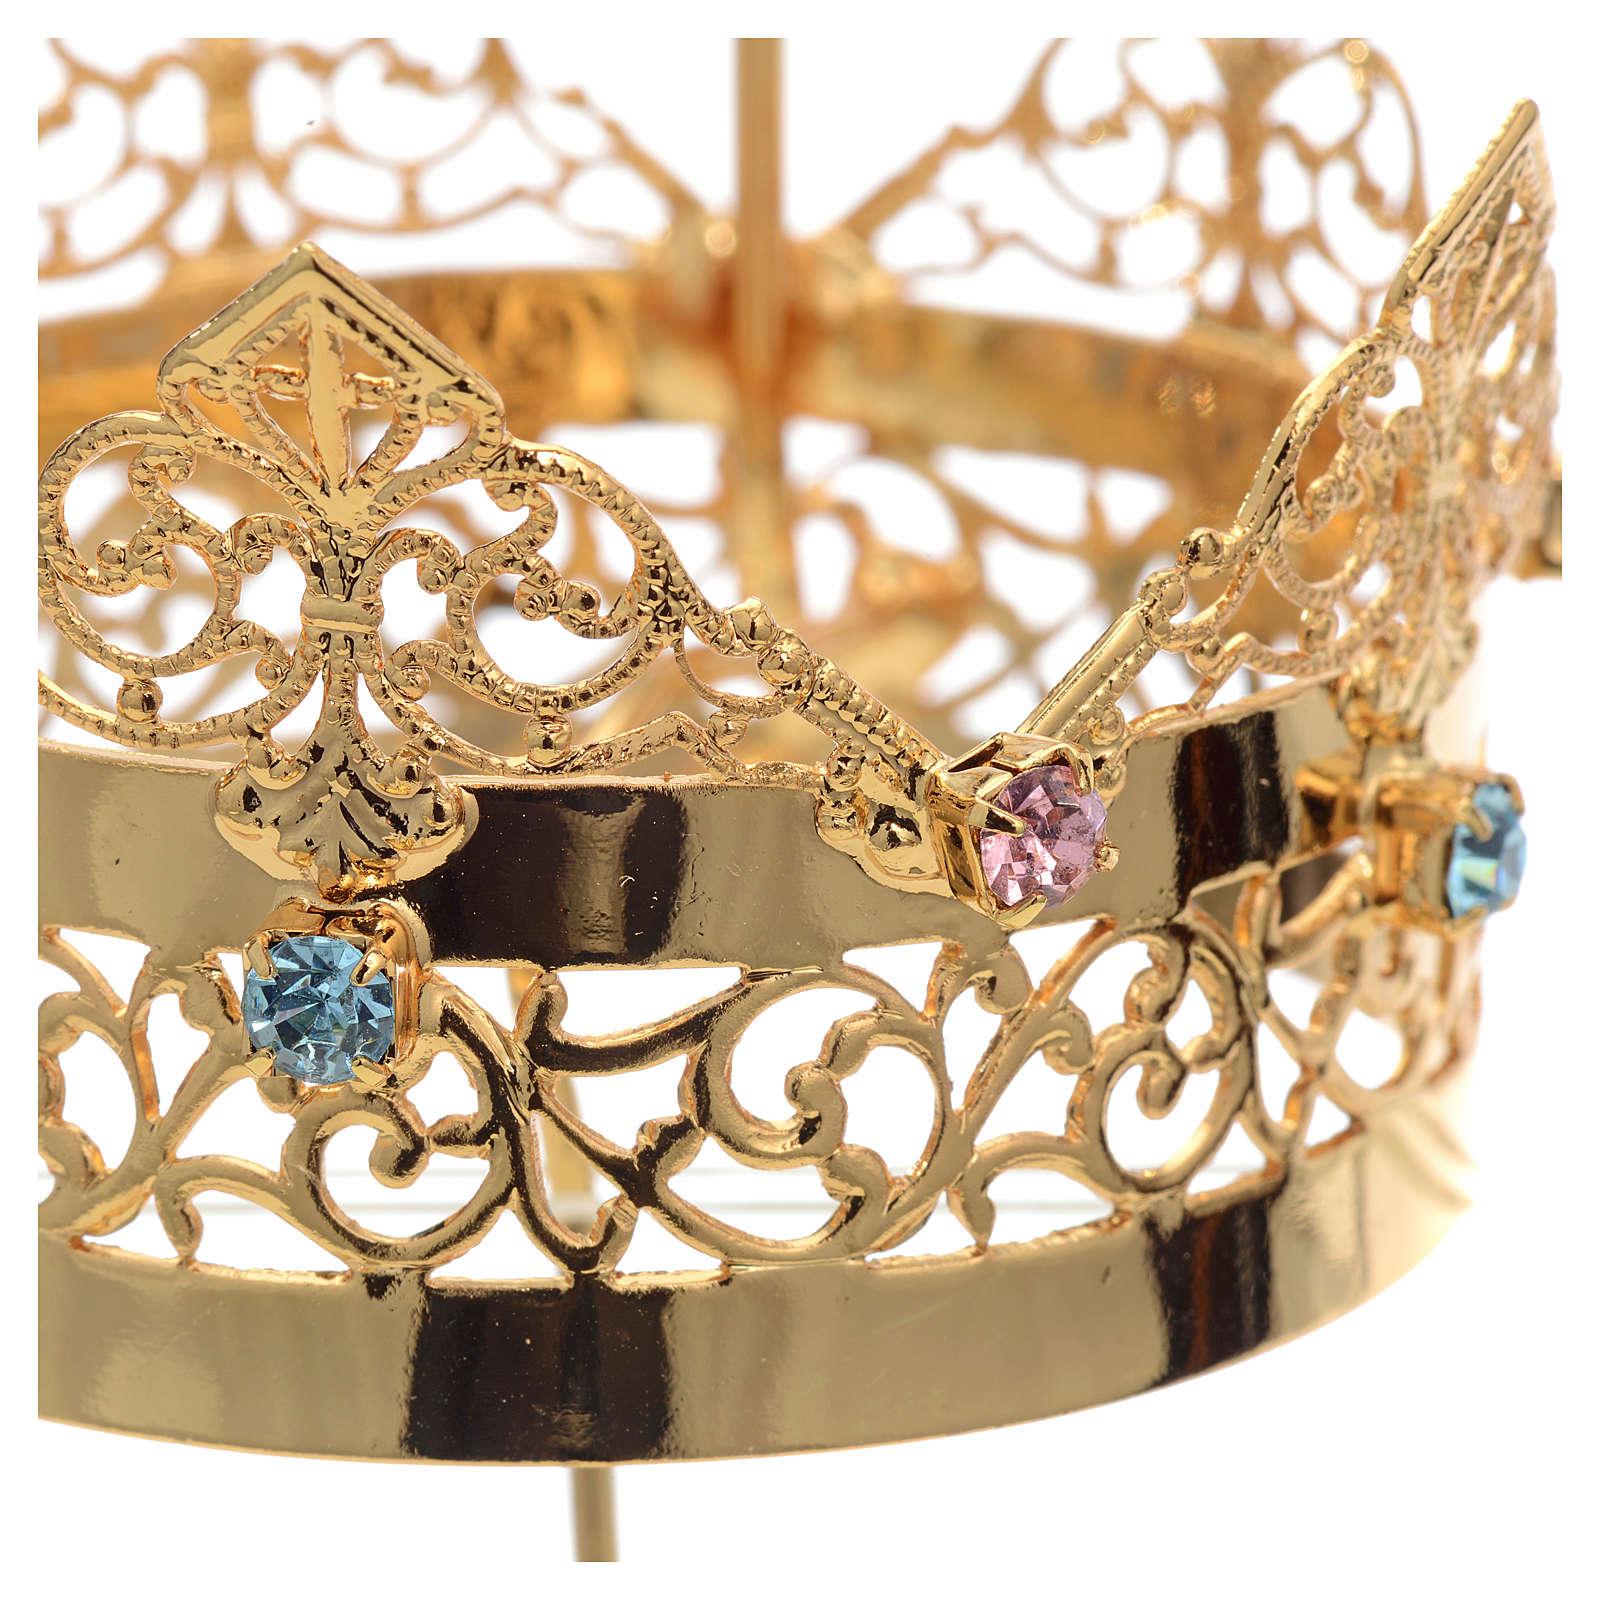 Corona con aureola ottone e strass 6 cm 3